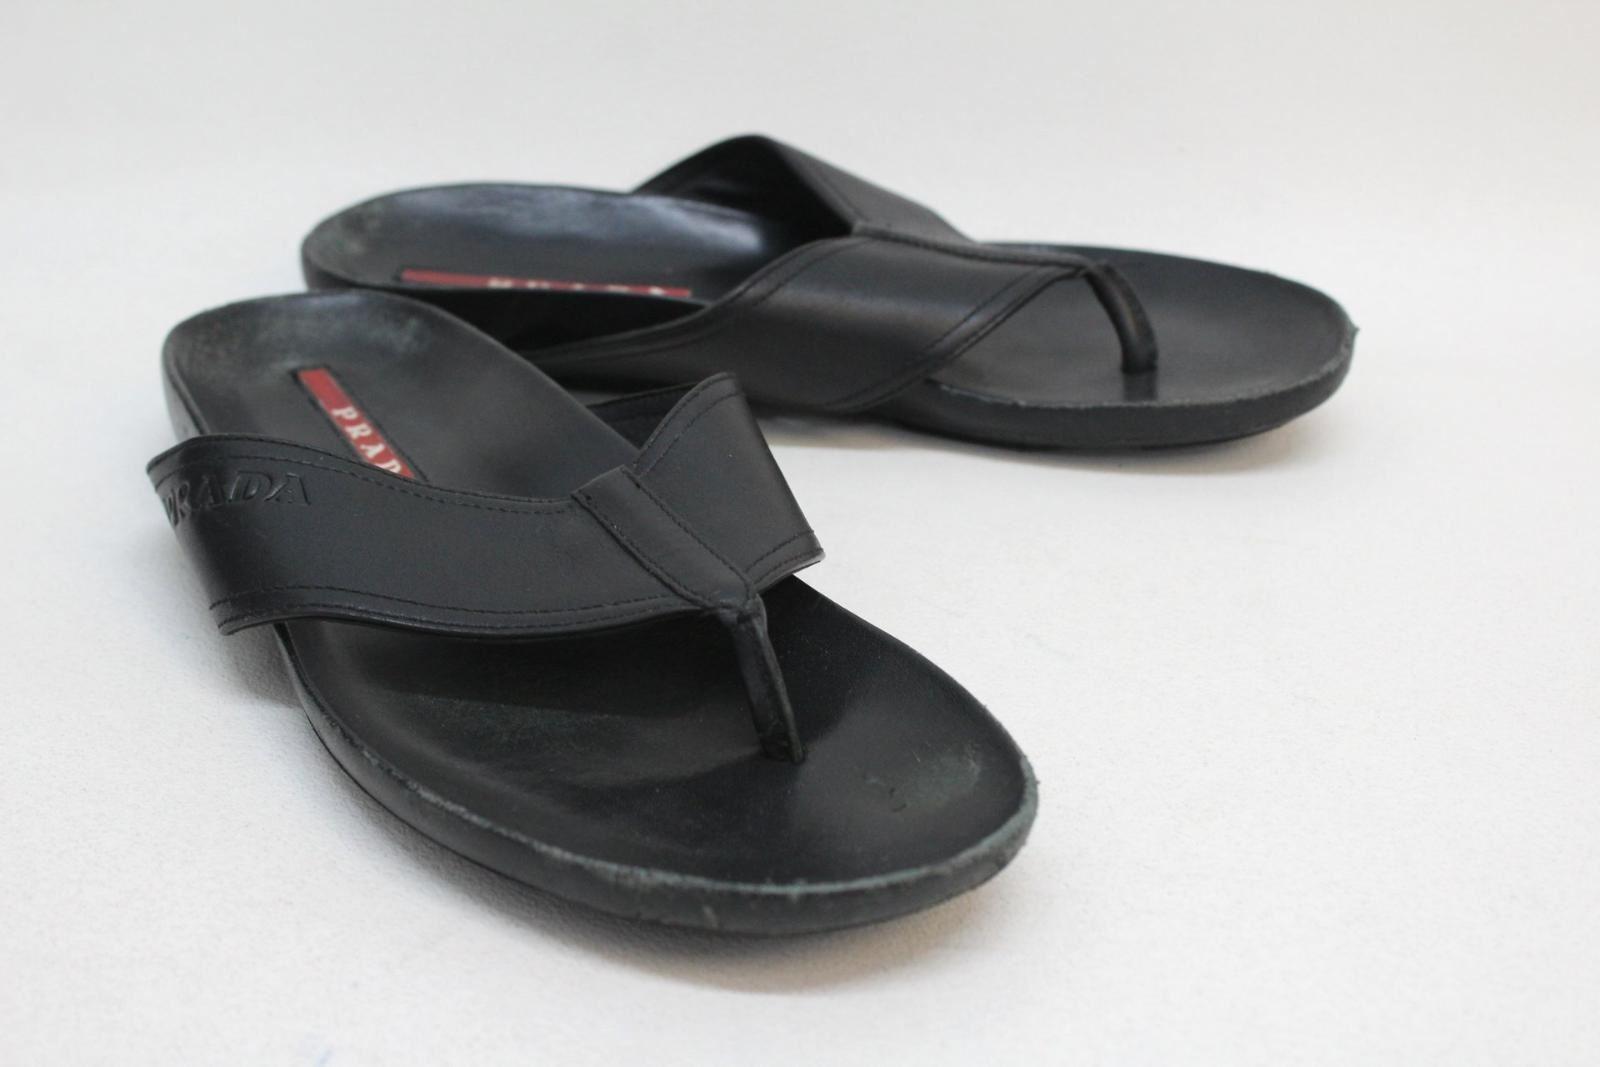 4b940675bca8 PRADA Men s Plain Black Leather Toe Post Flip Flop Sandal Shoes Size ...